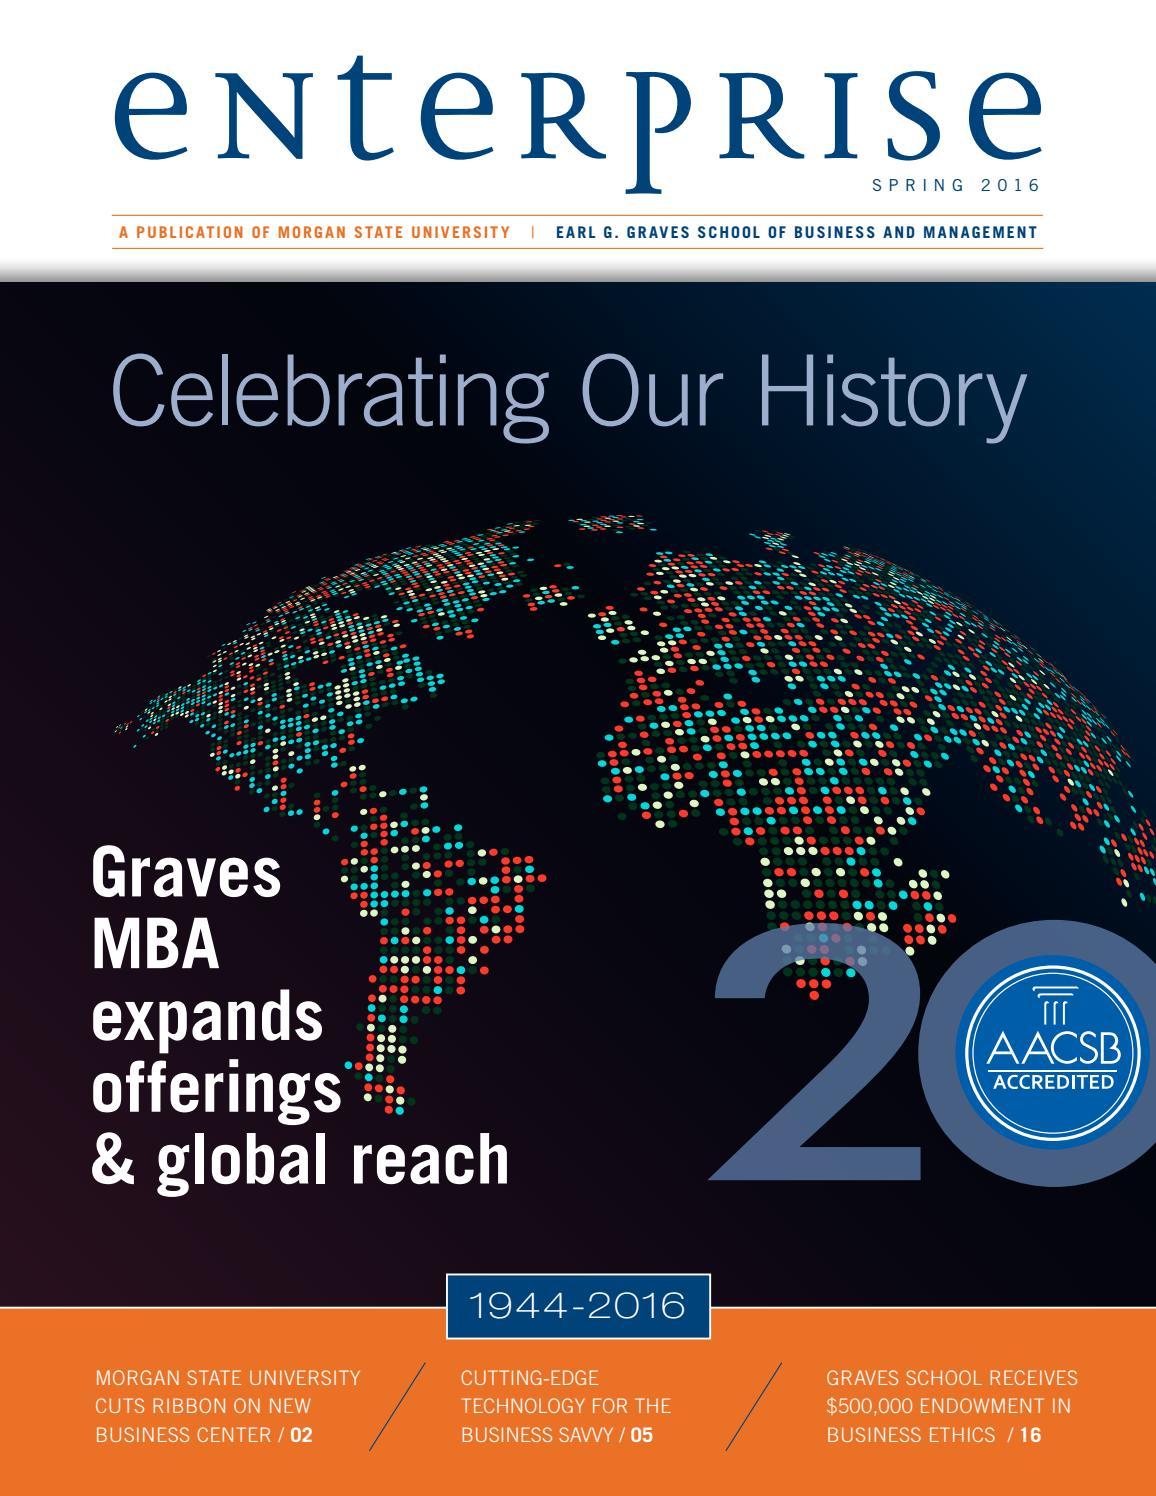 Enterprise Magazine - 2016 Issue by Morgan State University - issuu